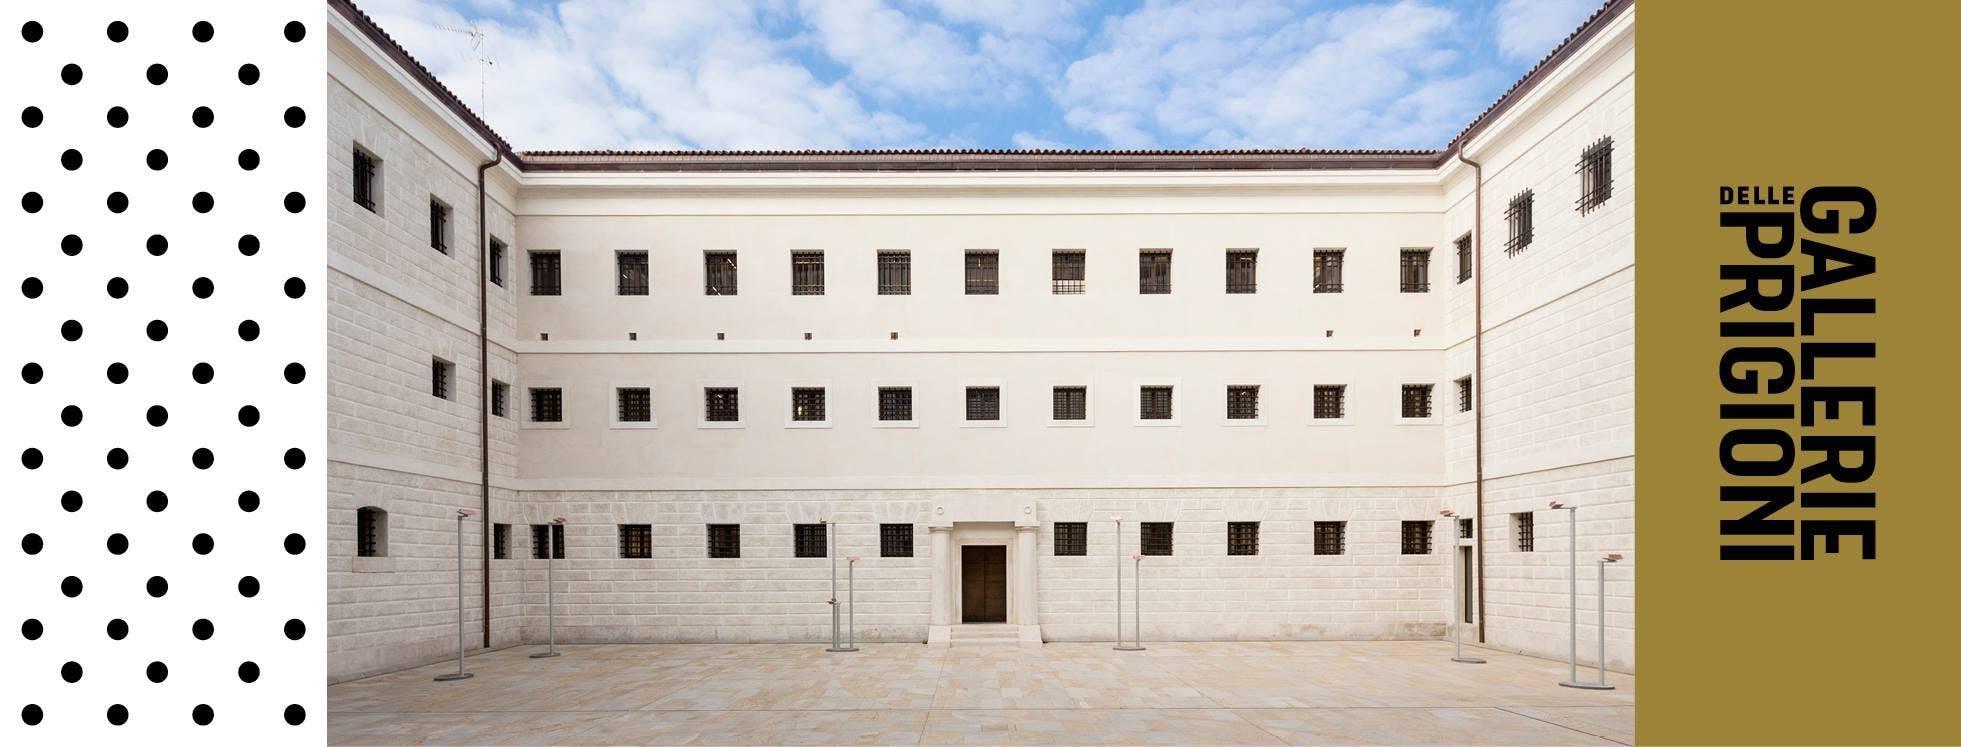 Visita guidata alle Gallerie delle Prigioni